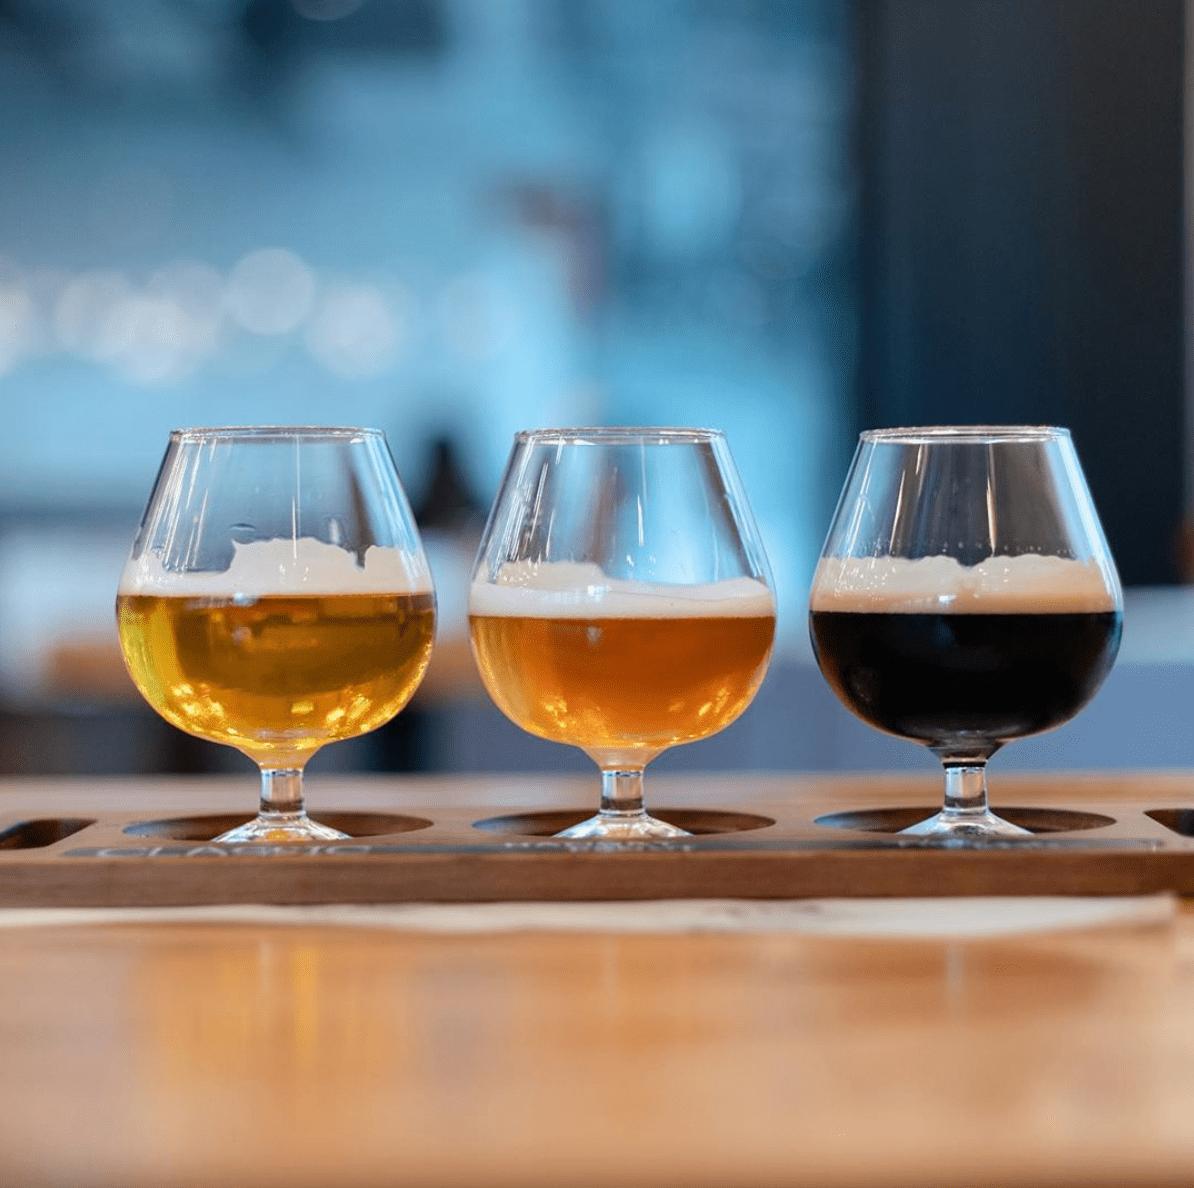 手工啤酒 TAP The Ale Project 旺角酒吧 CraftBeer